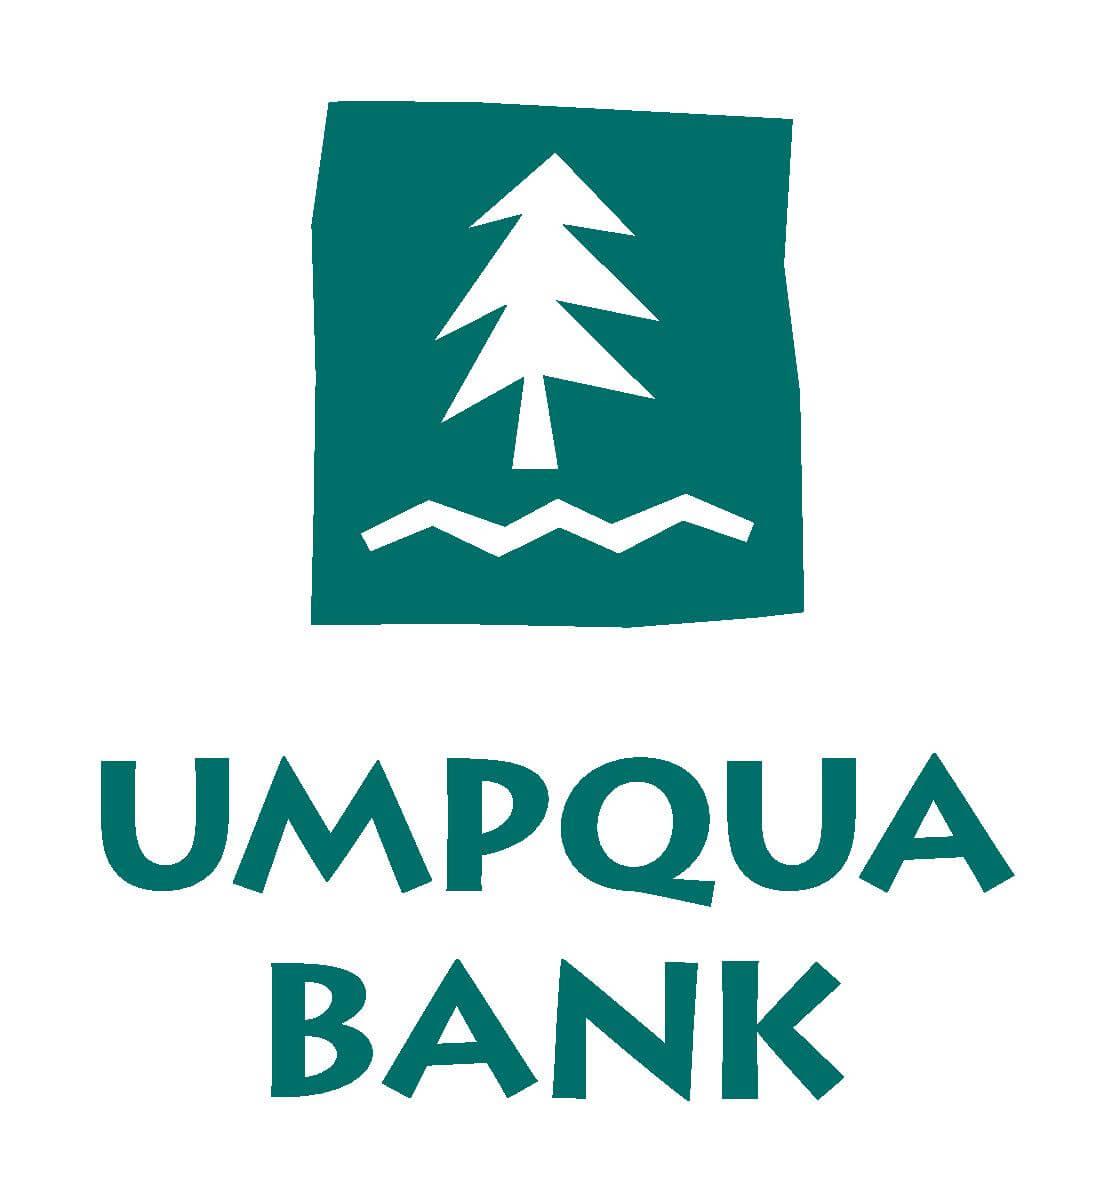 umpqua-bank